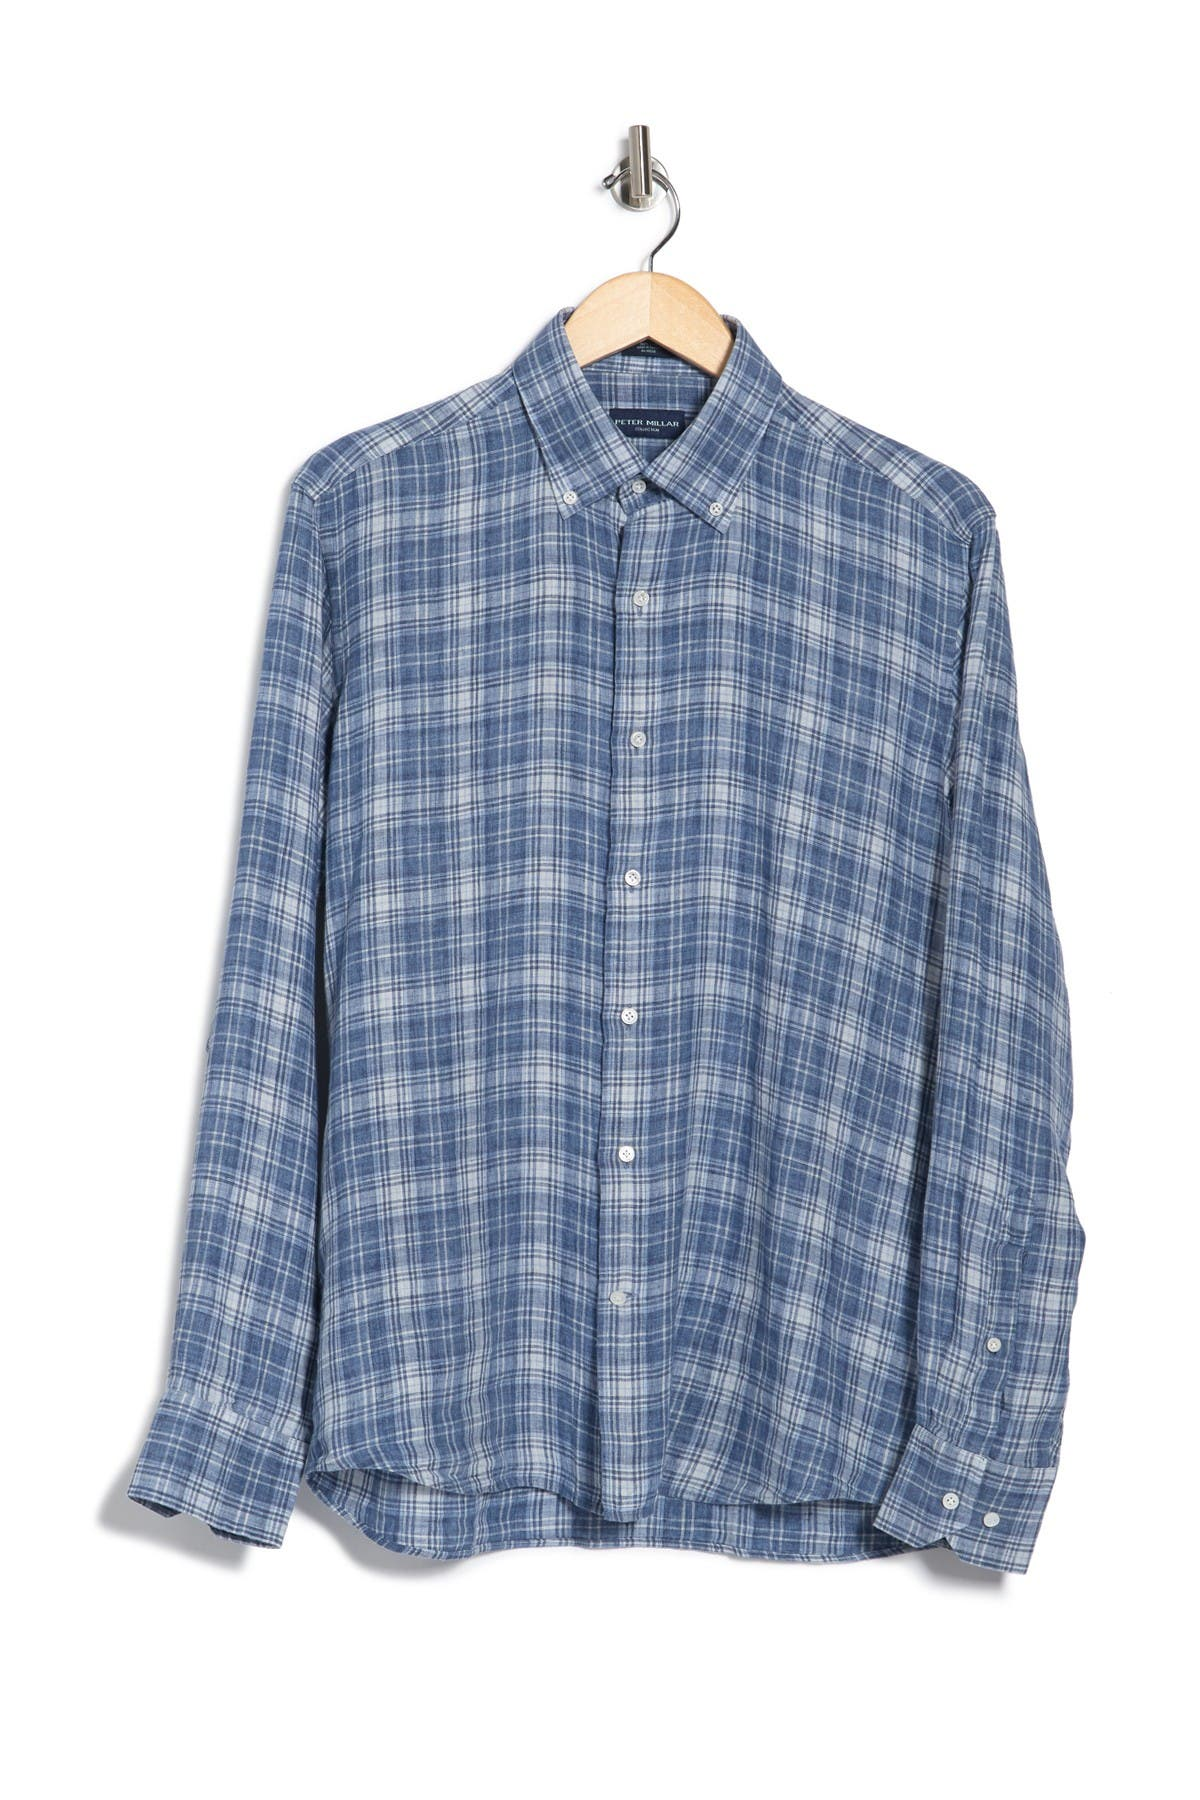 Image of Peter Millar Avignon Plaid Linen Shirt